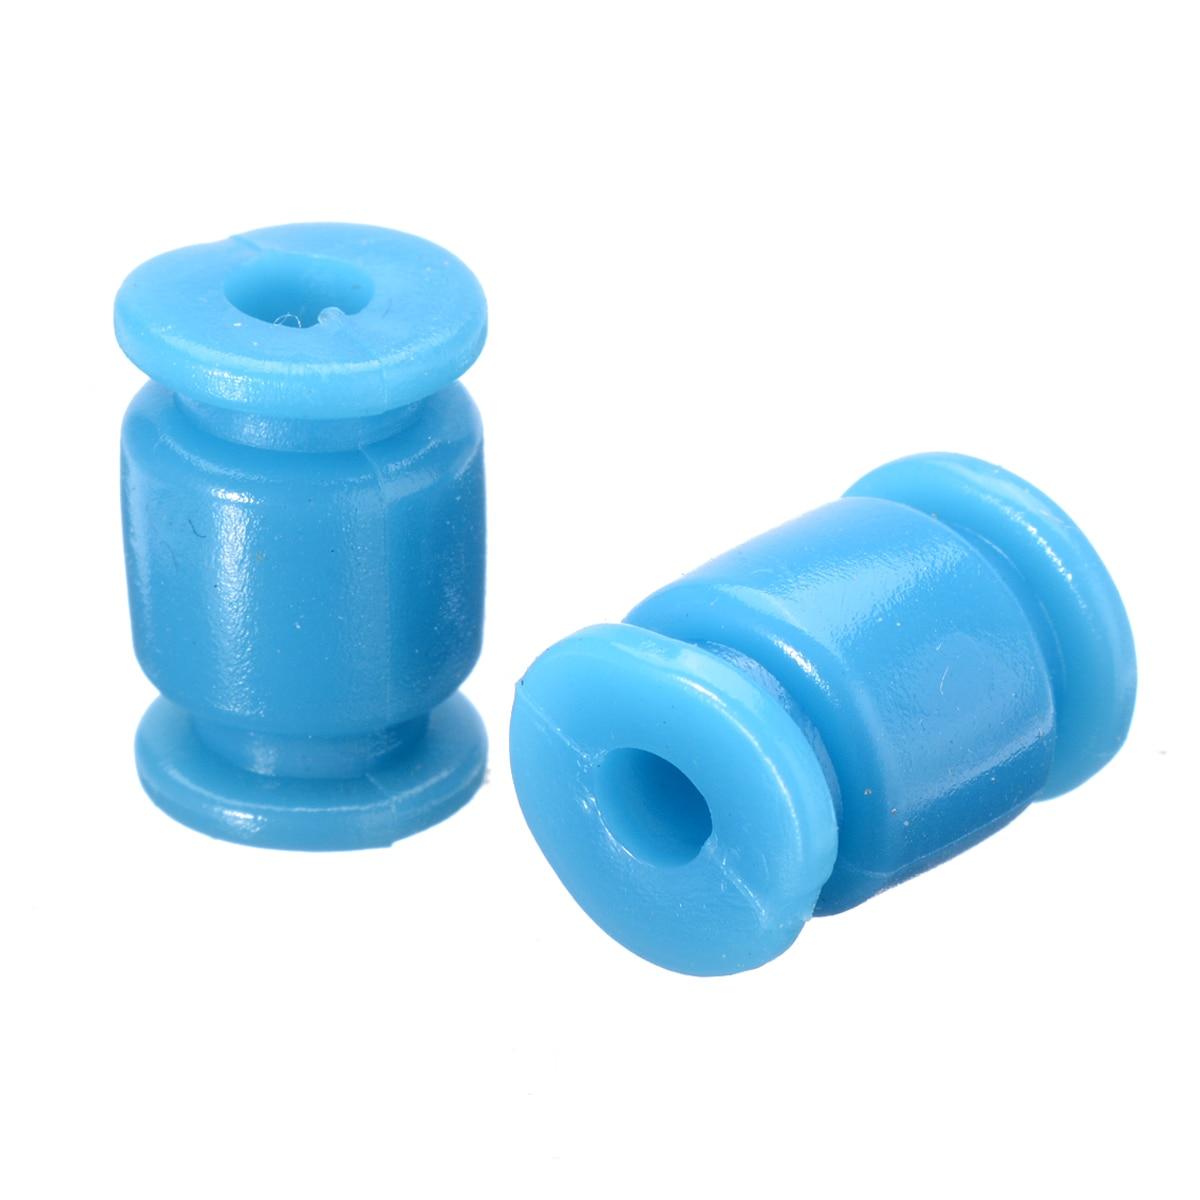 8Pcs//lot Vibration Damping Ball Anti-vibration Rubber Shock Absorber Ball